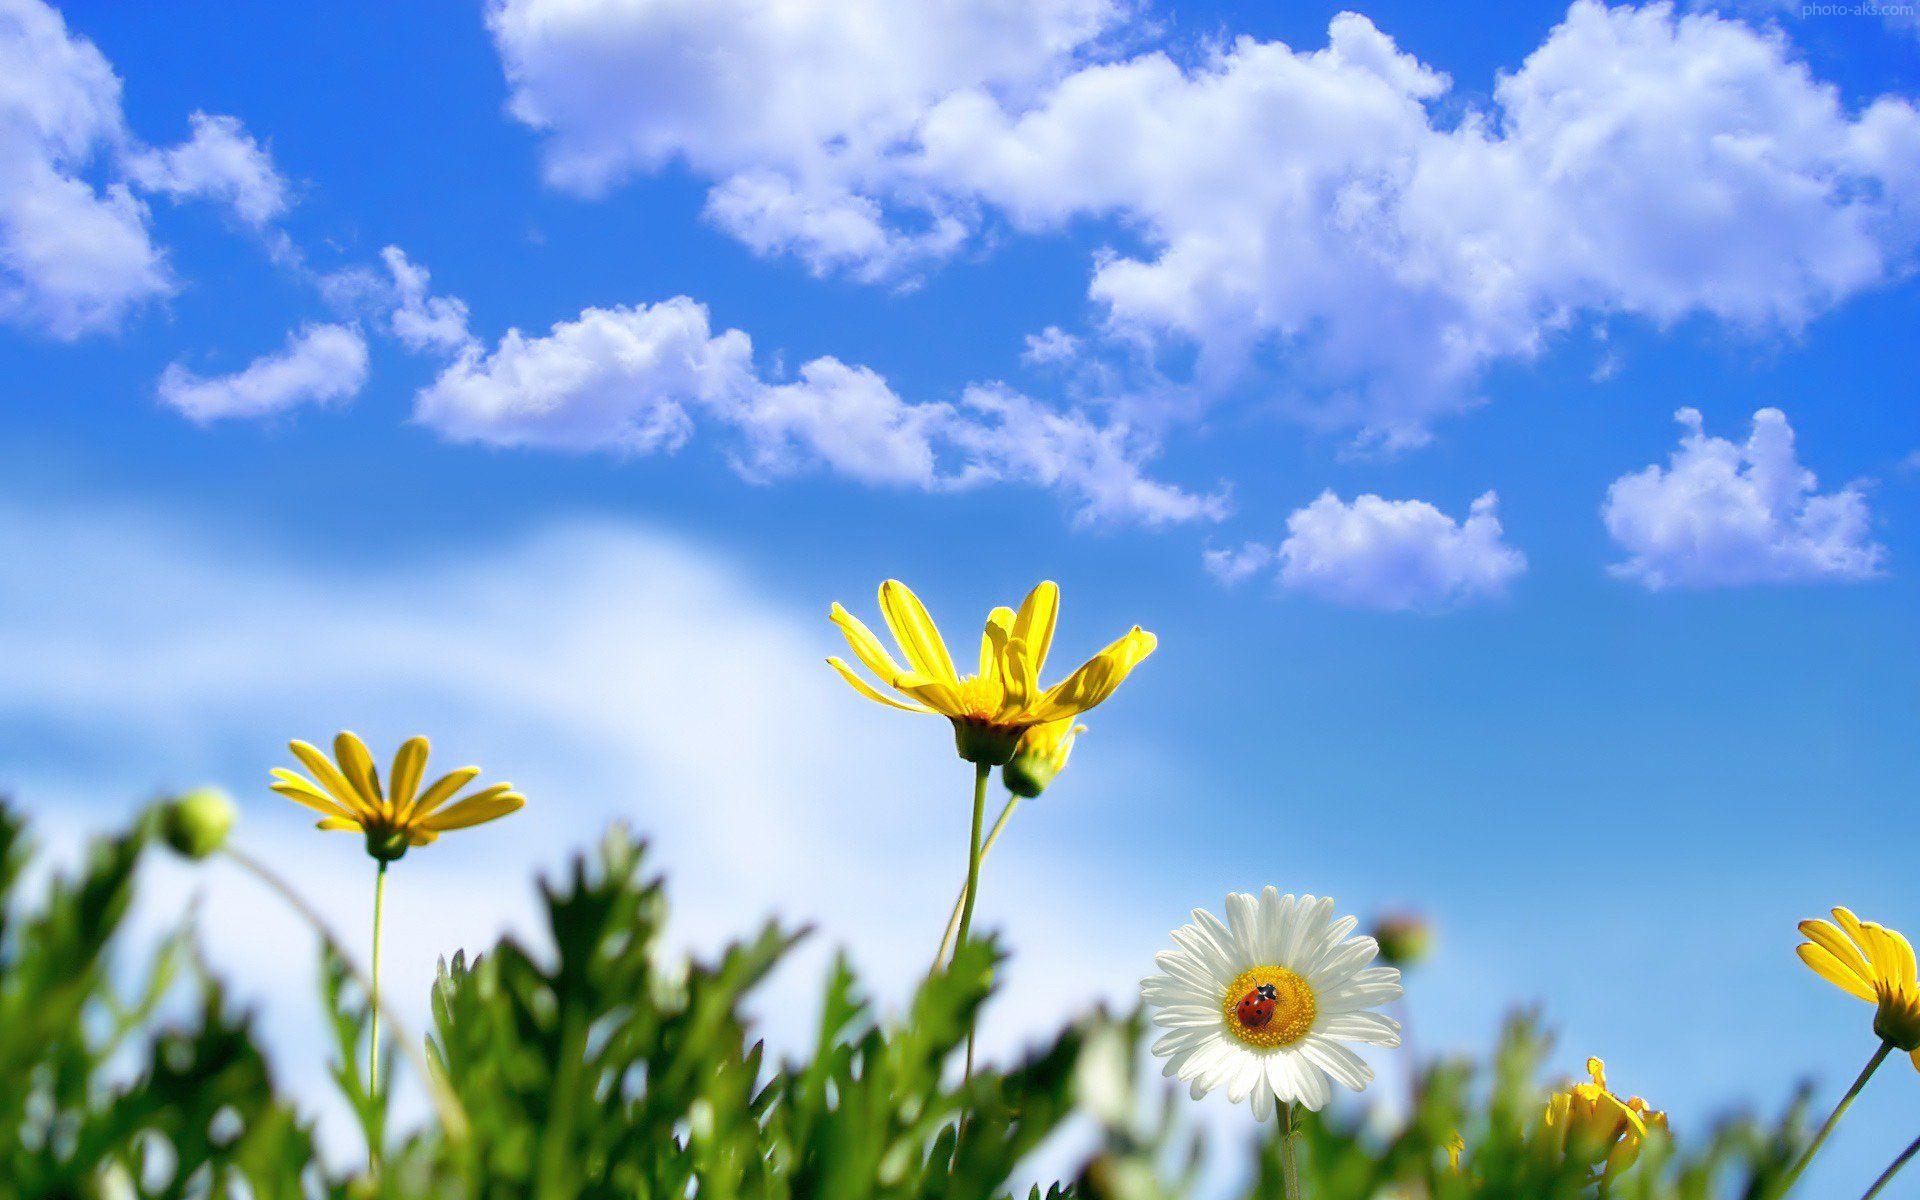 http://www.uplooder.net/img/image/6/9cc8551b2ecd960527e9e33a46c522bf/nature_springtime_wallpaper.jpg